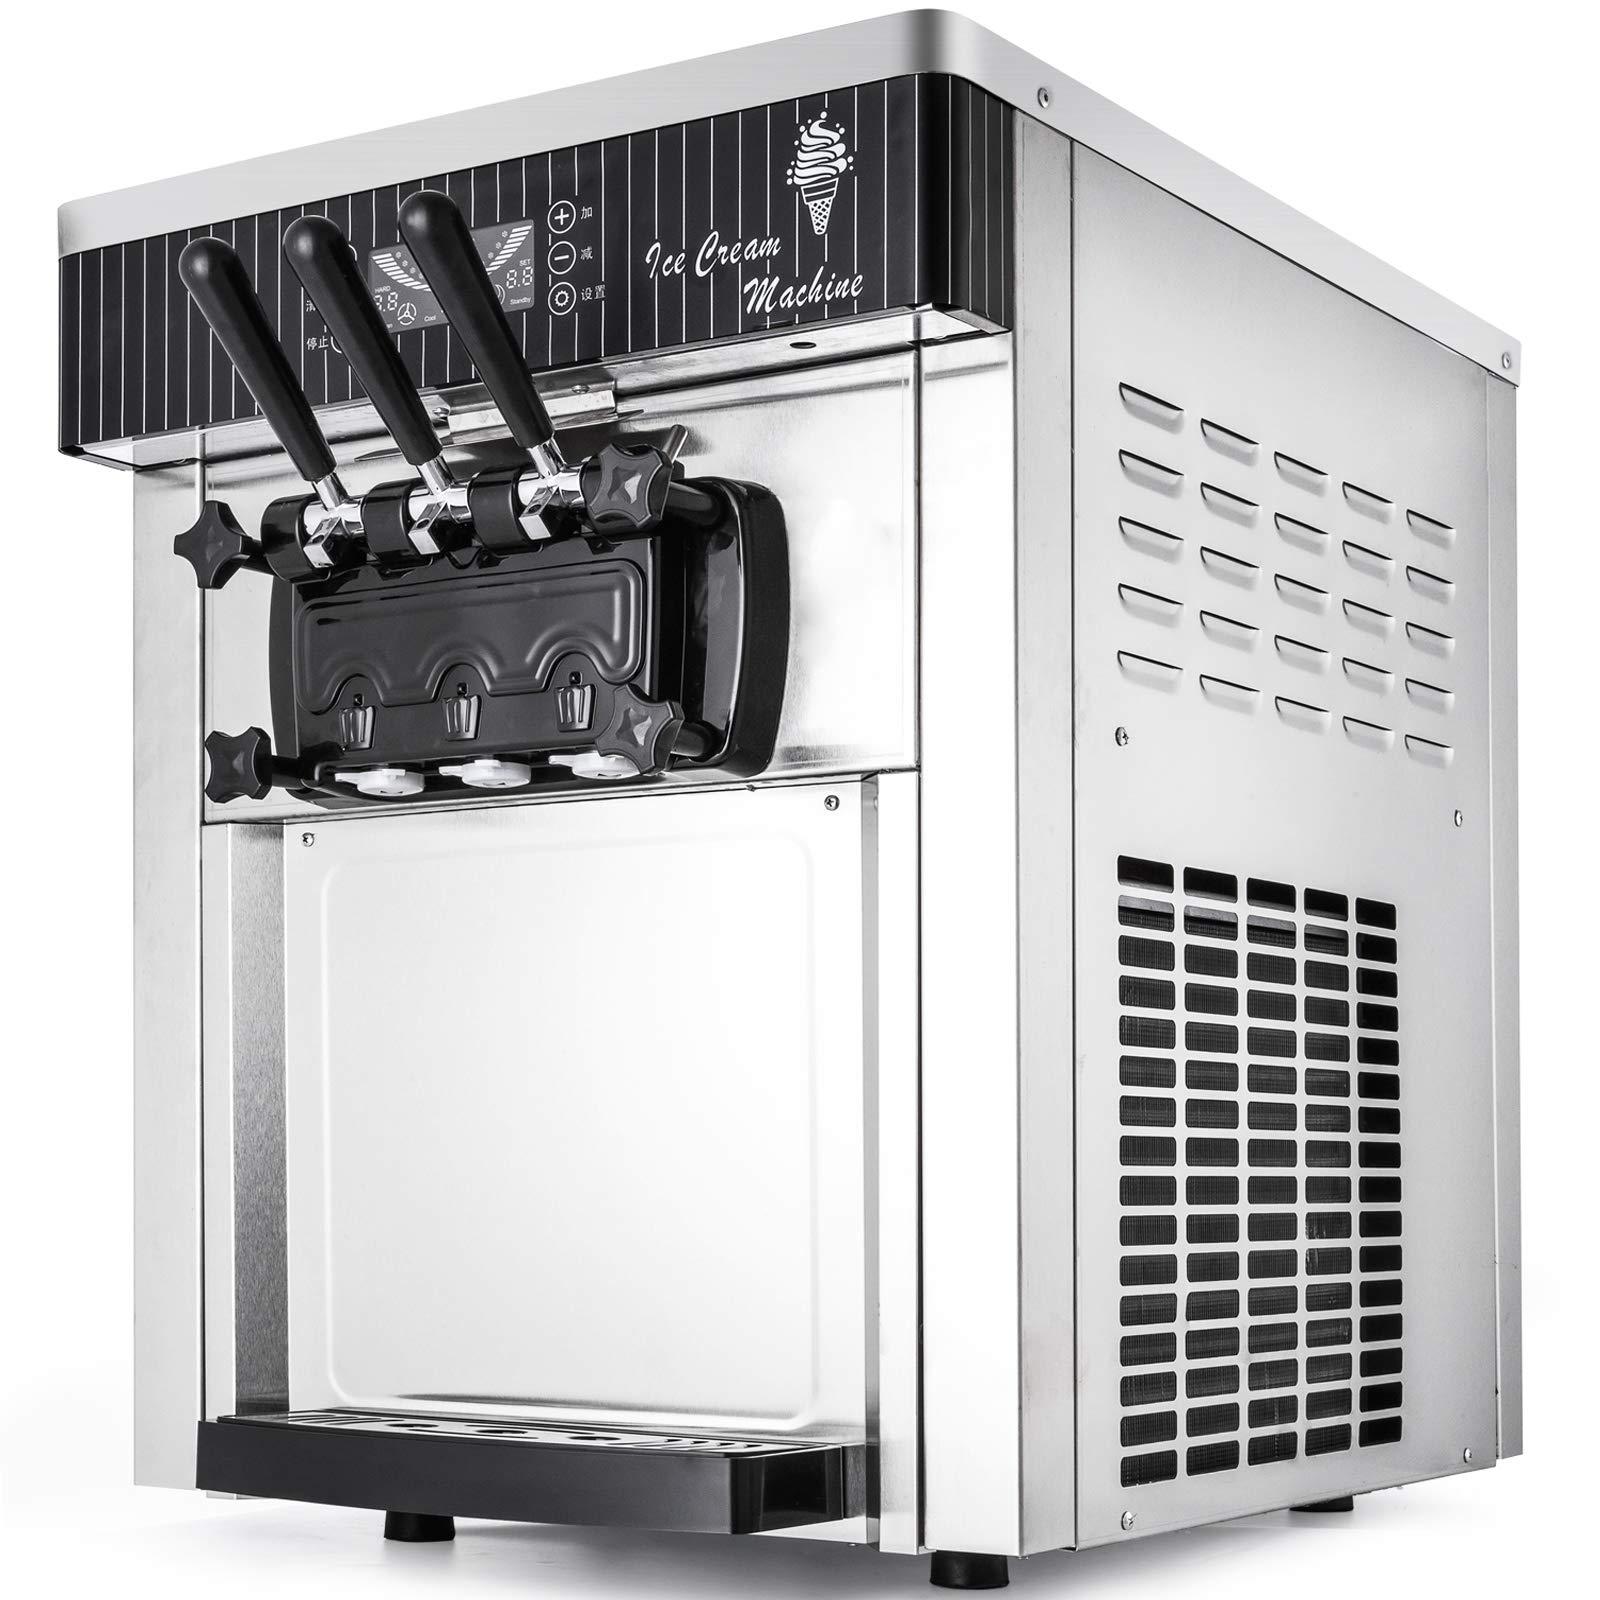 VEVOR 2200W Commercial Soft Ice Cream Machine 3 Flavors 5.3-7.4Gallons/H Auto Clean LED Panel Perfect for Restaurants Snack Bar supermarkets, 2200W, Sliver/Desktop